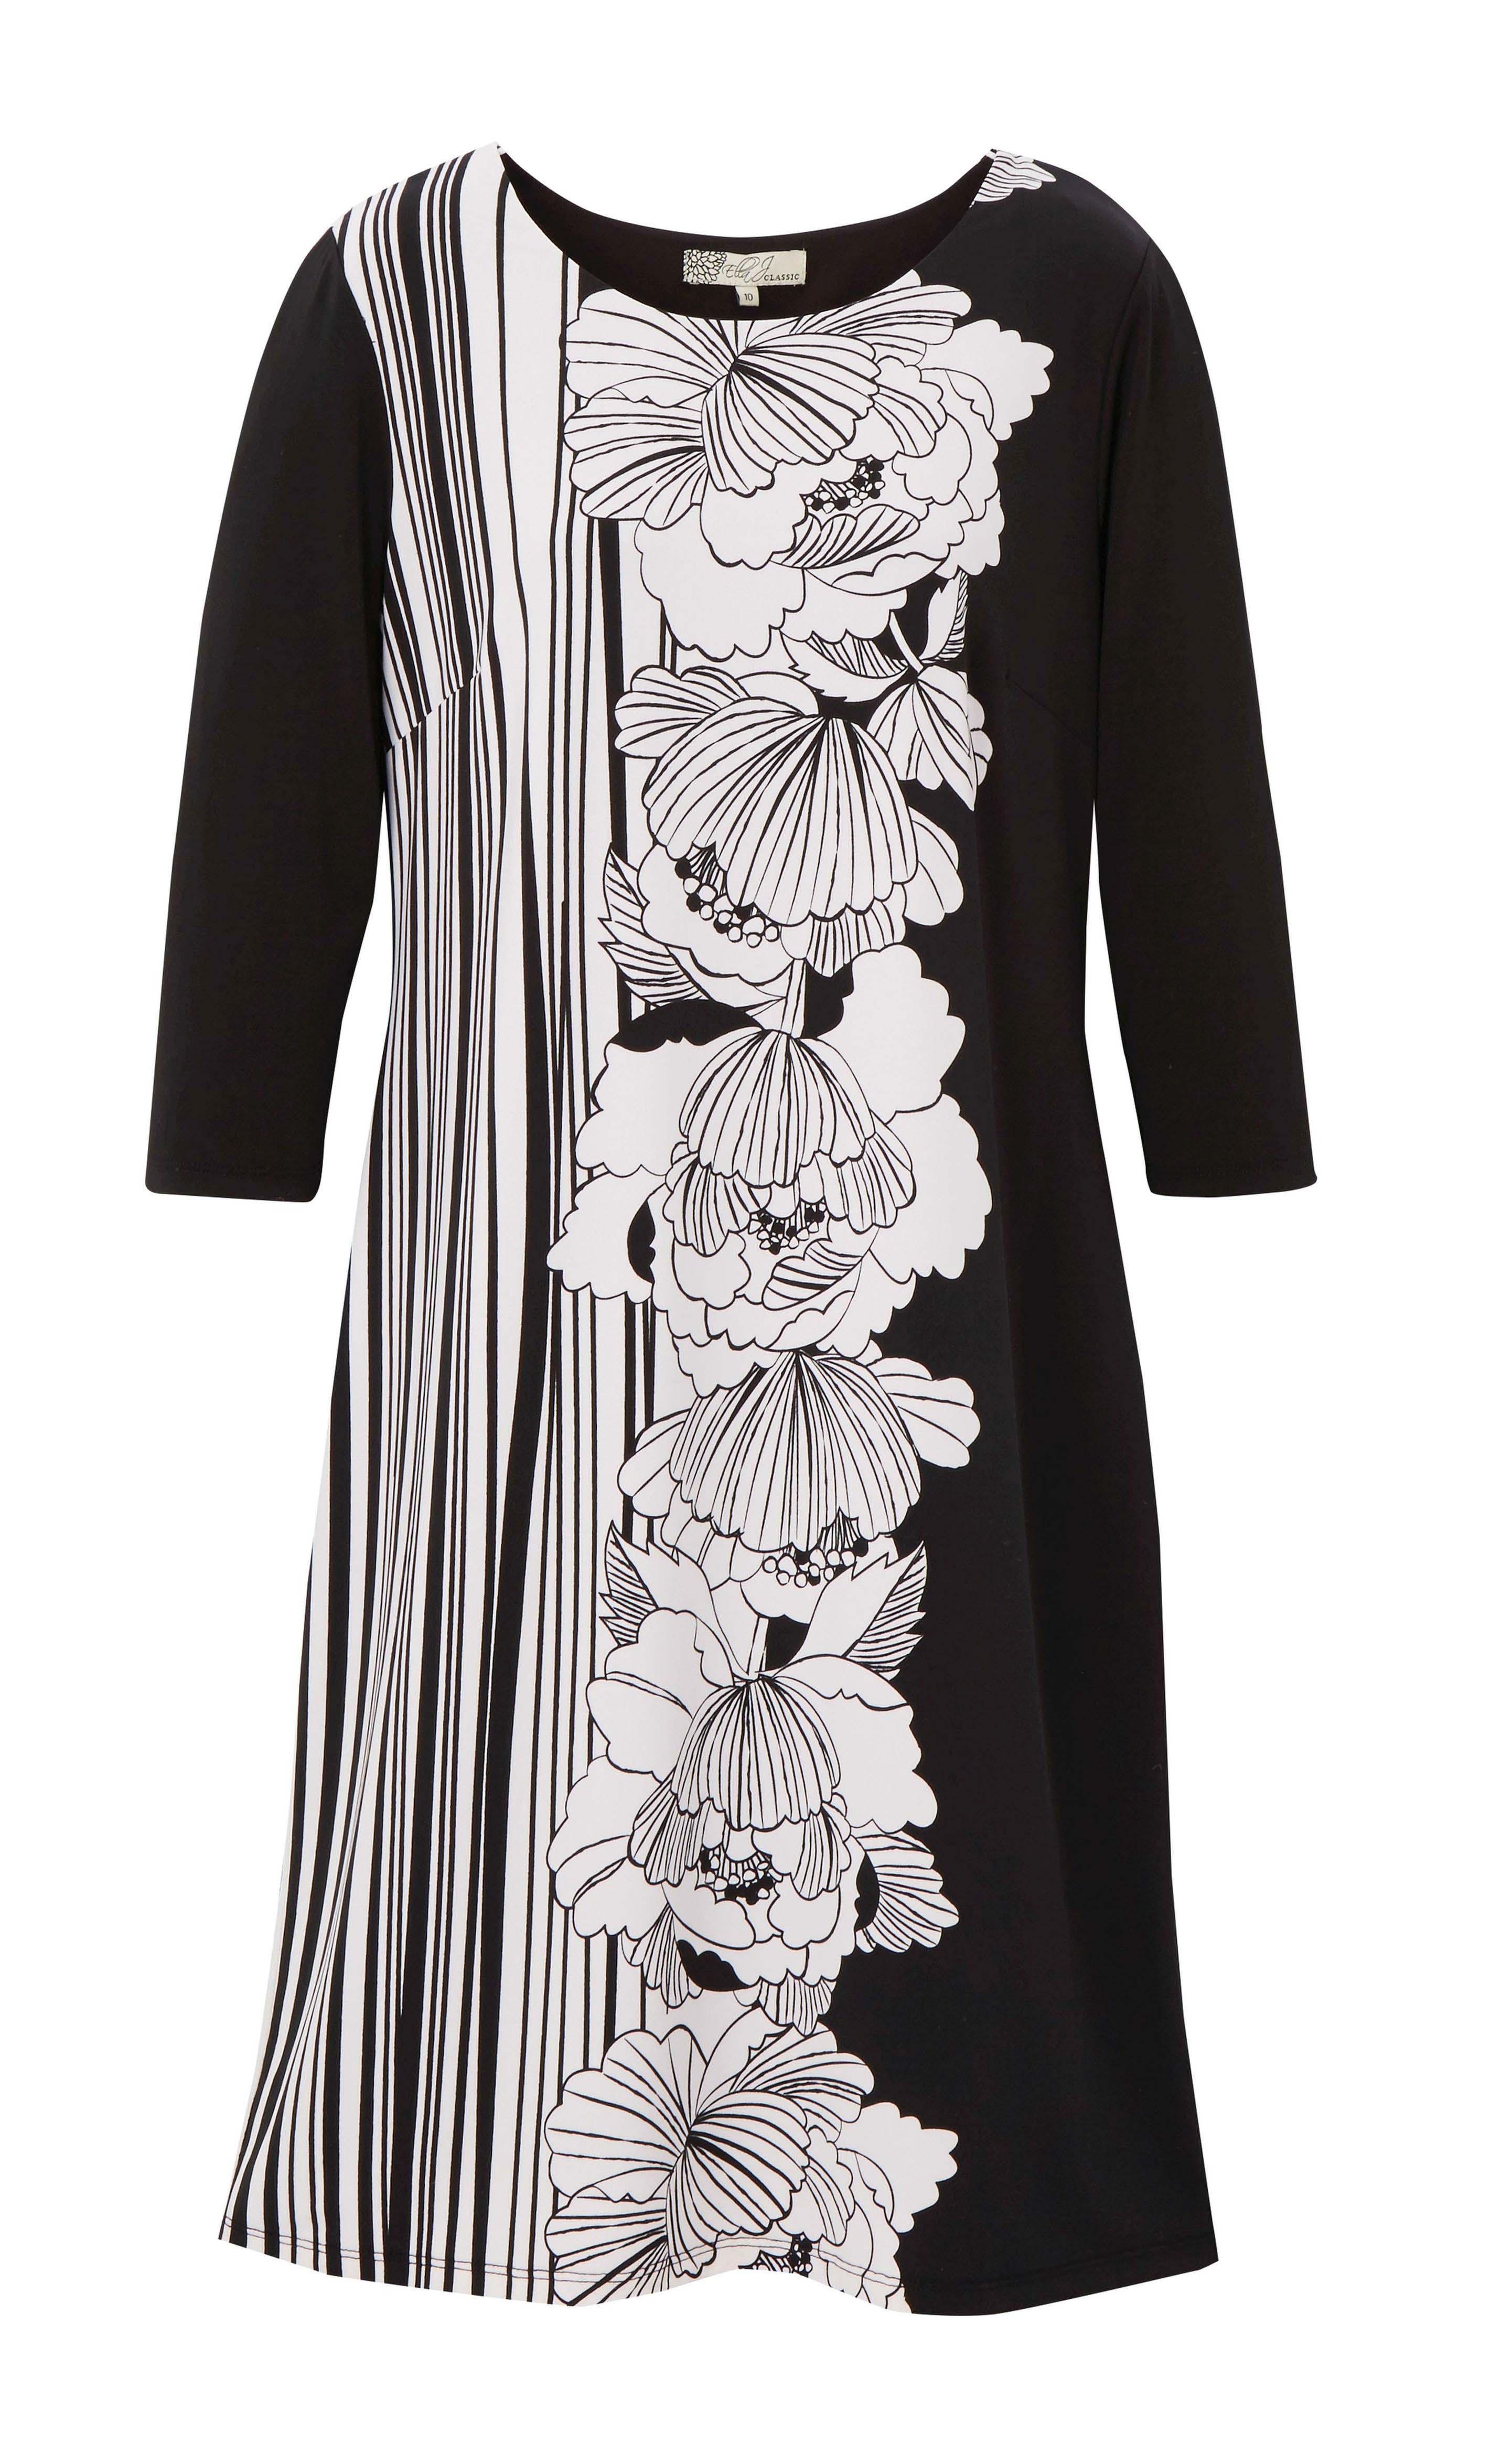 6090018 Ella J Classic Dress Flower Print Black White $79.99 Instore 29 Feb 2016